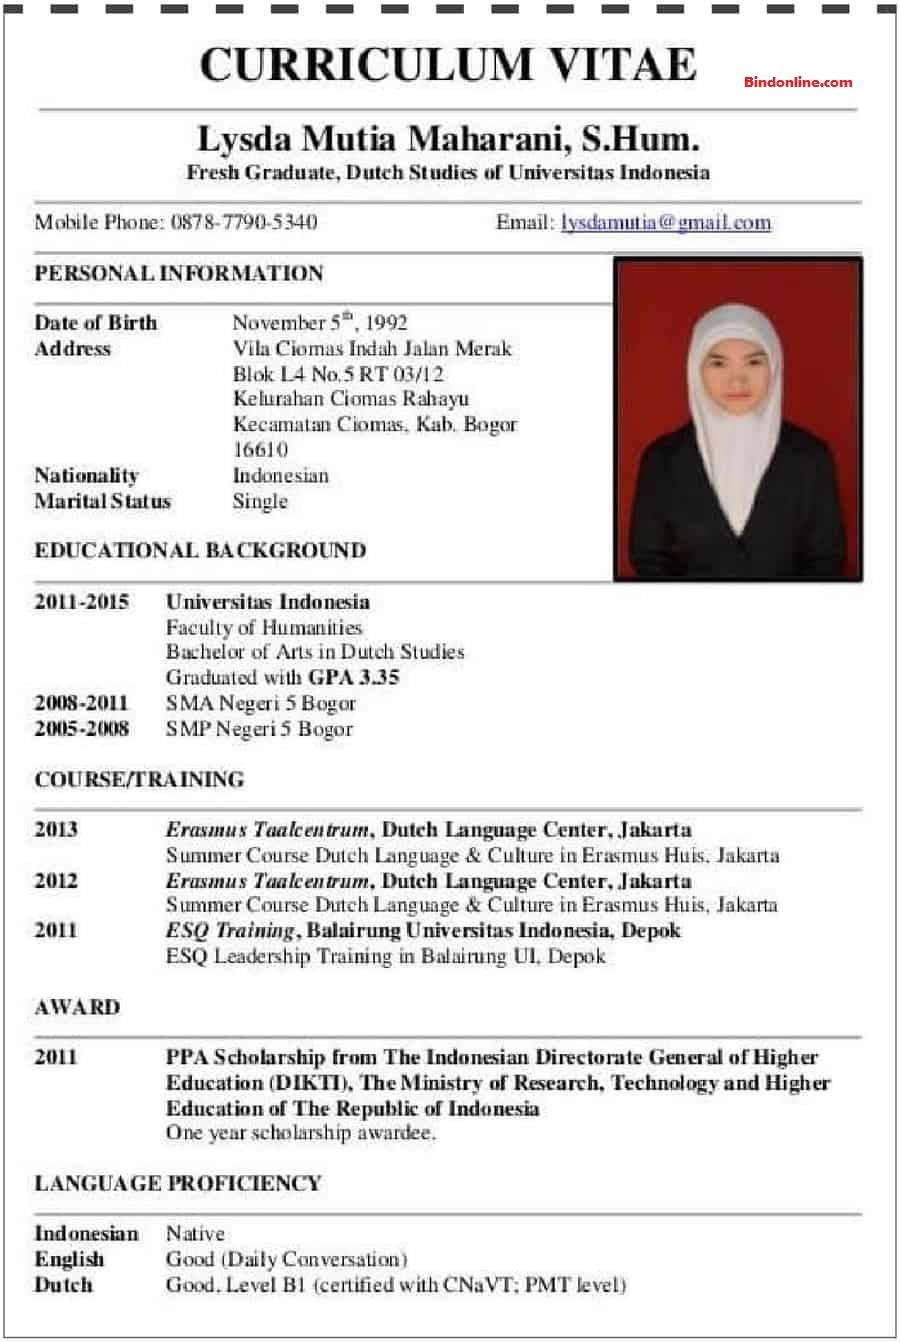 Contoh CV dalam bahasa inggris terbaik